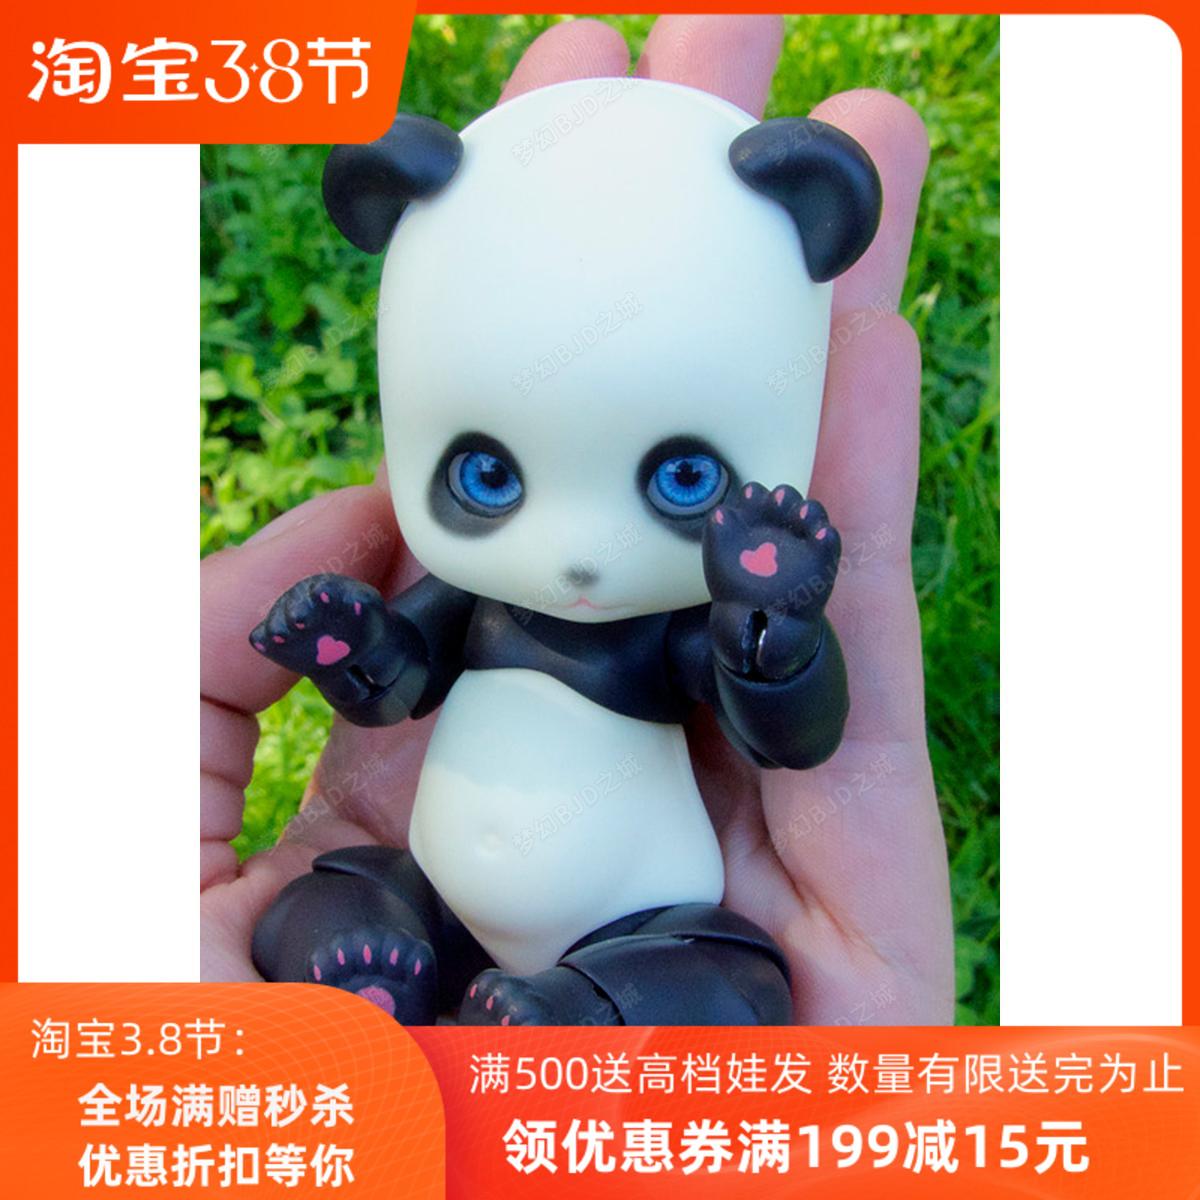 bjd doll cute little budding doll baby panda SD doll